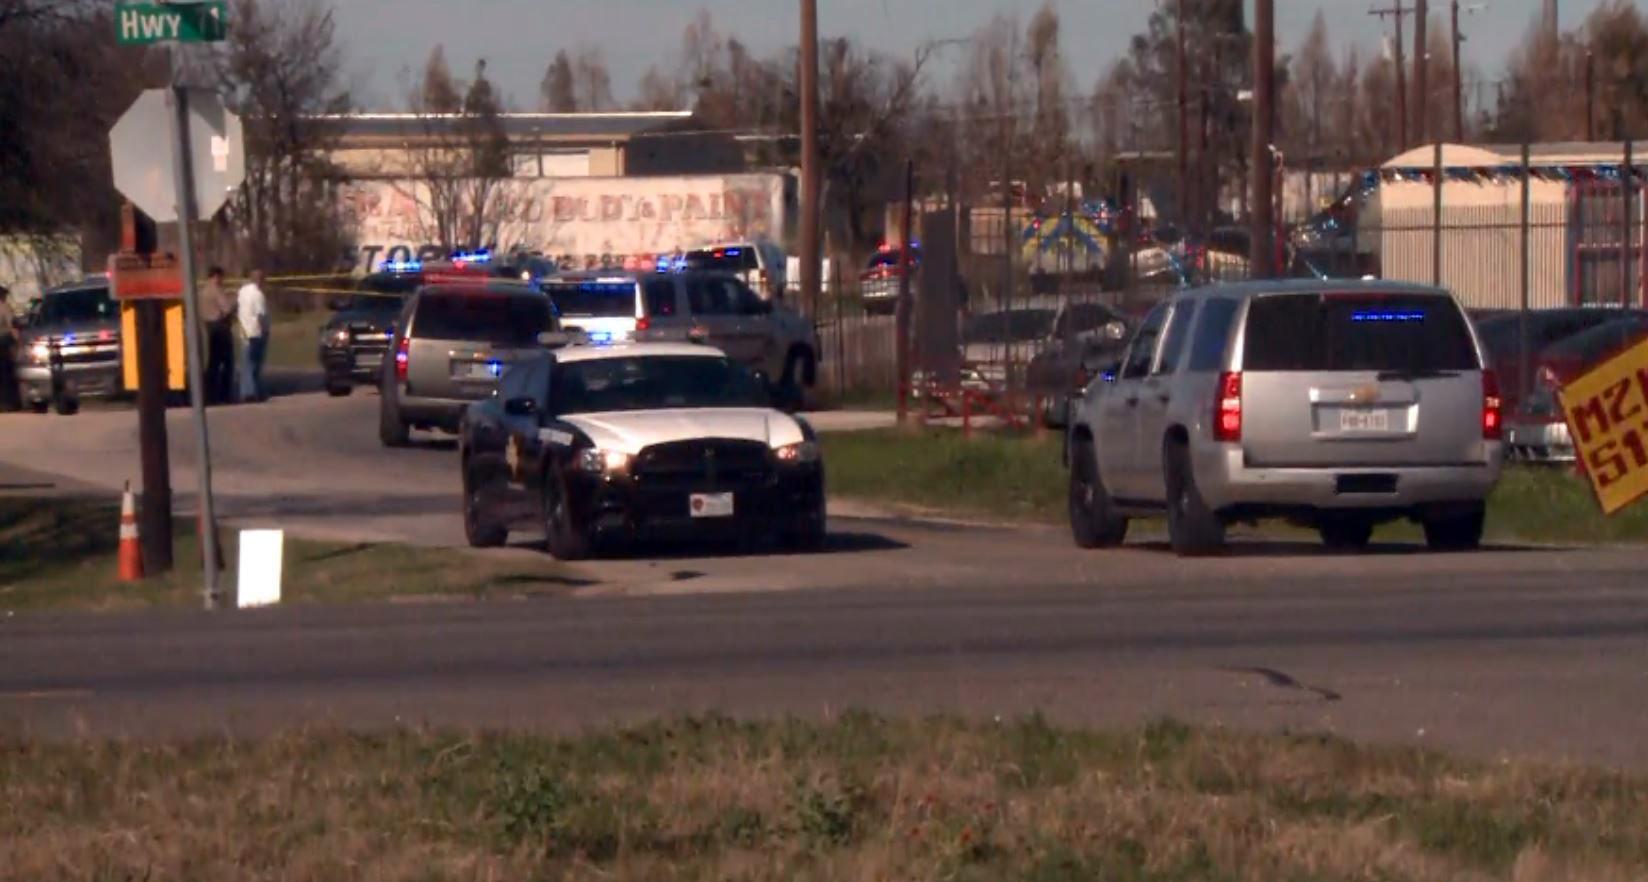 State Highway 71 Deputy involved shooting_419881